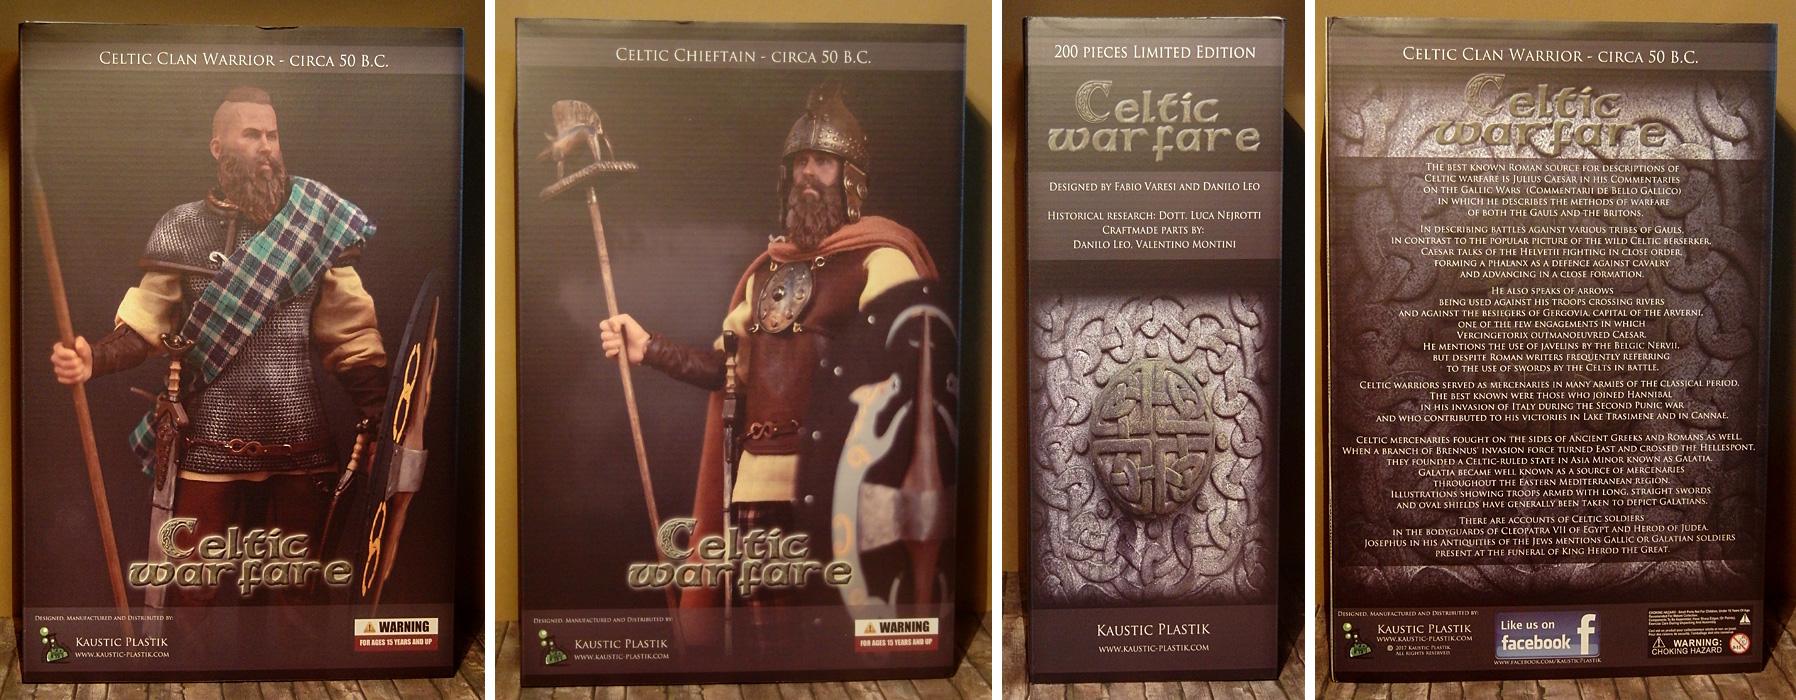 kp-celts-box1